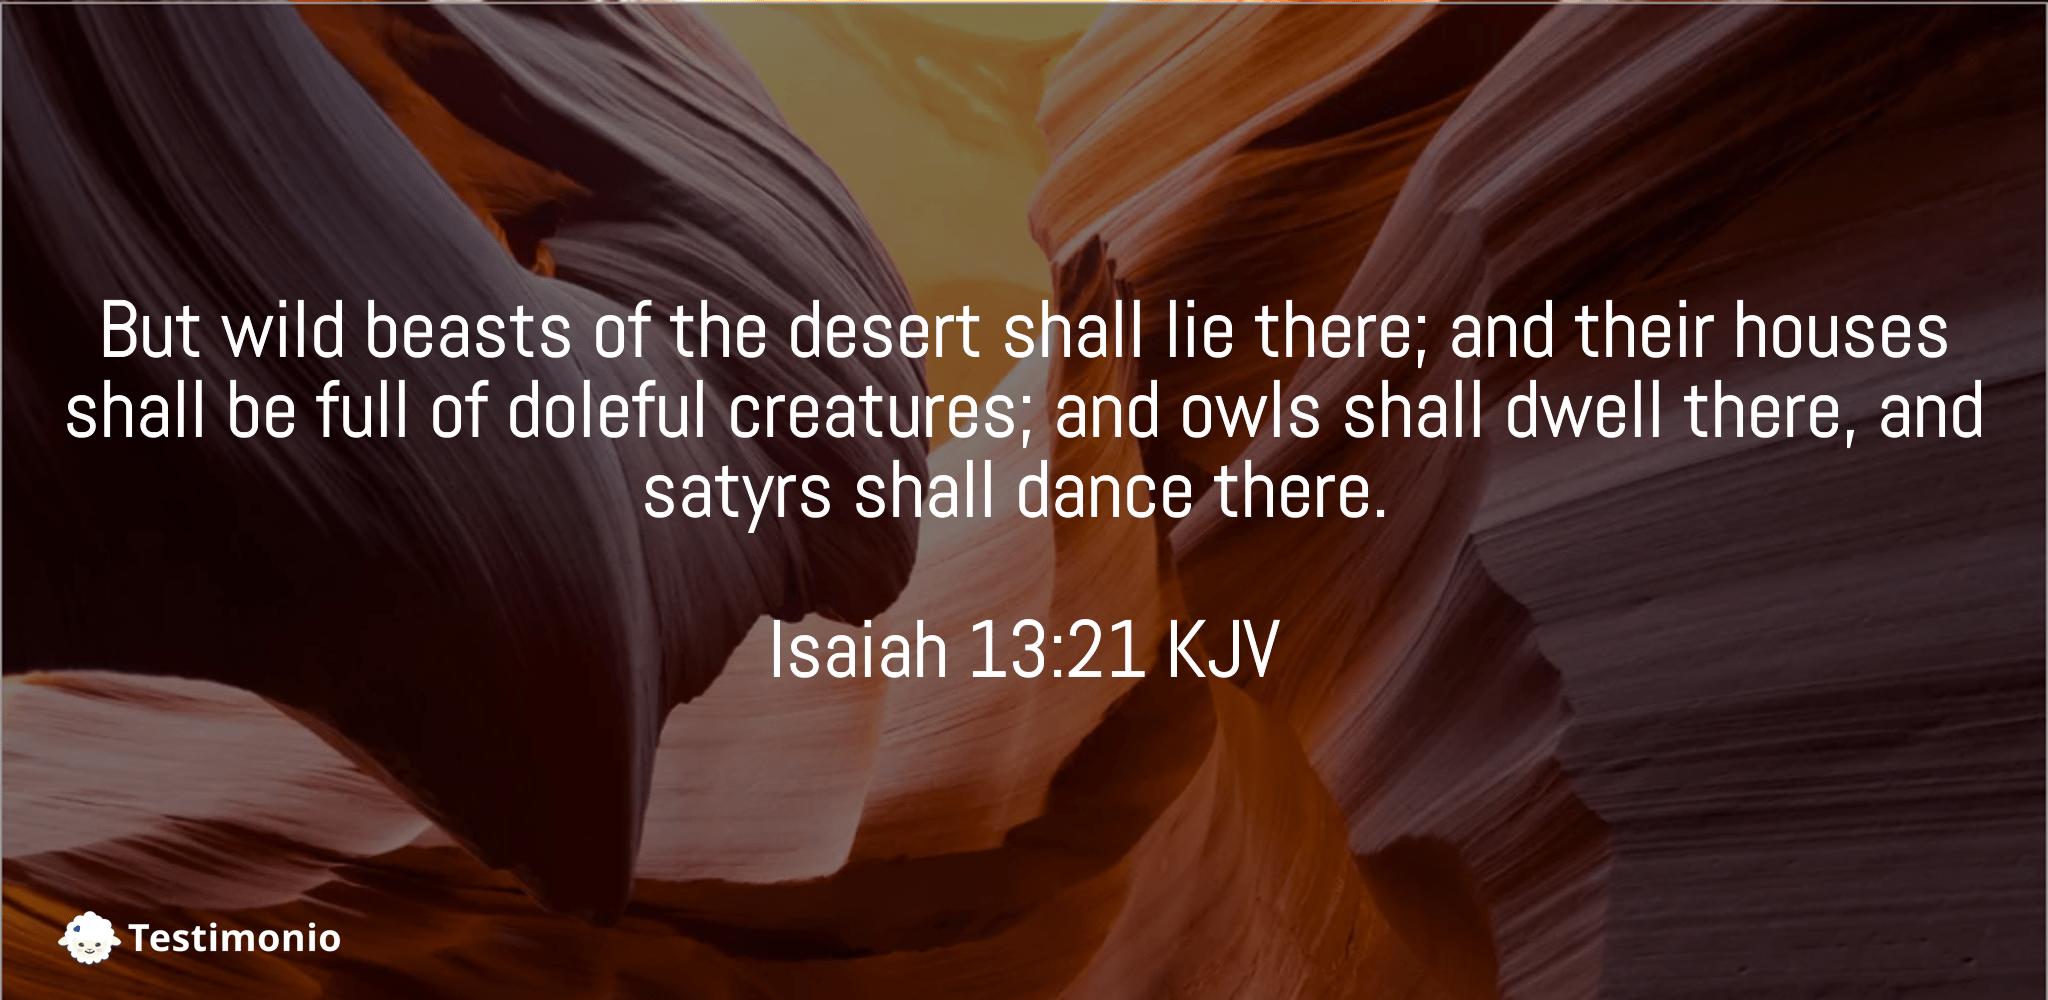 Isaiah 13:21